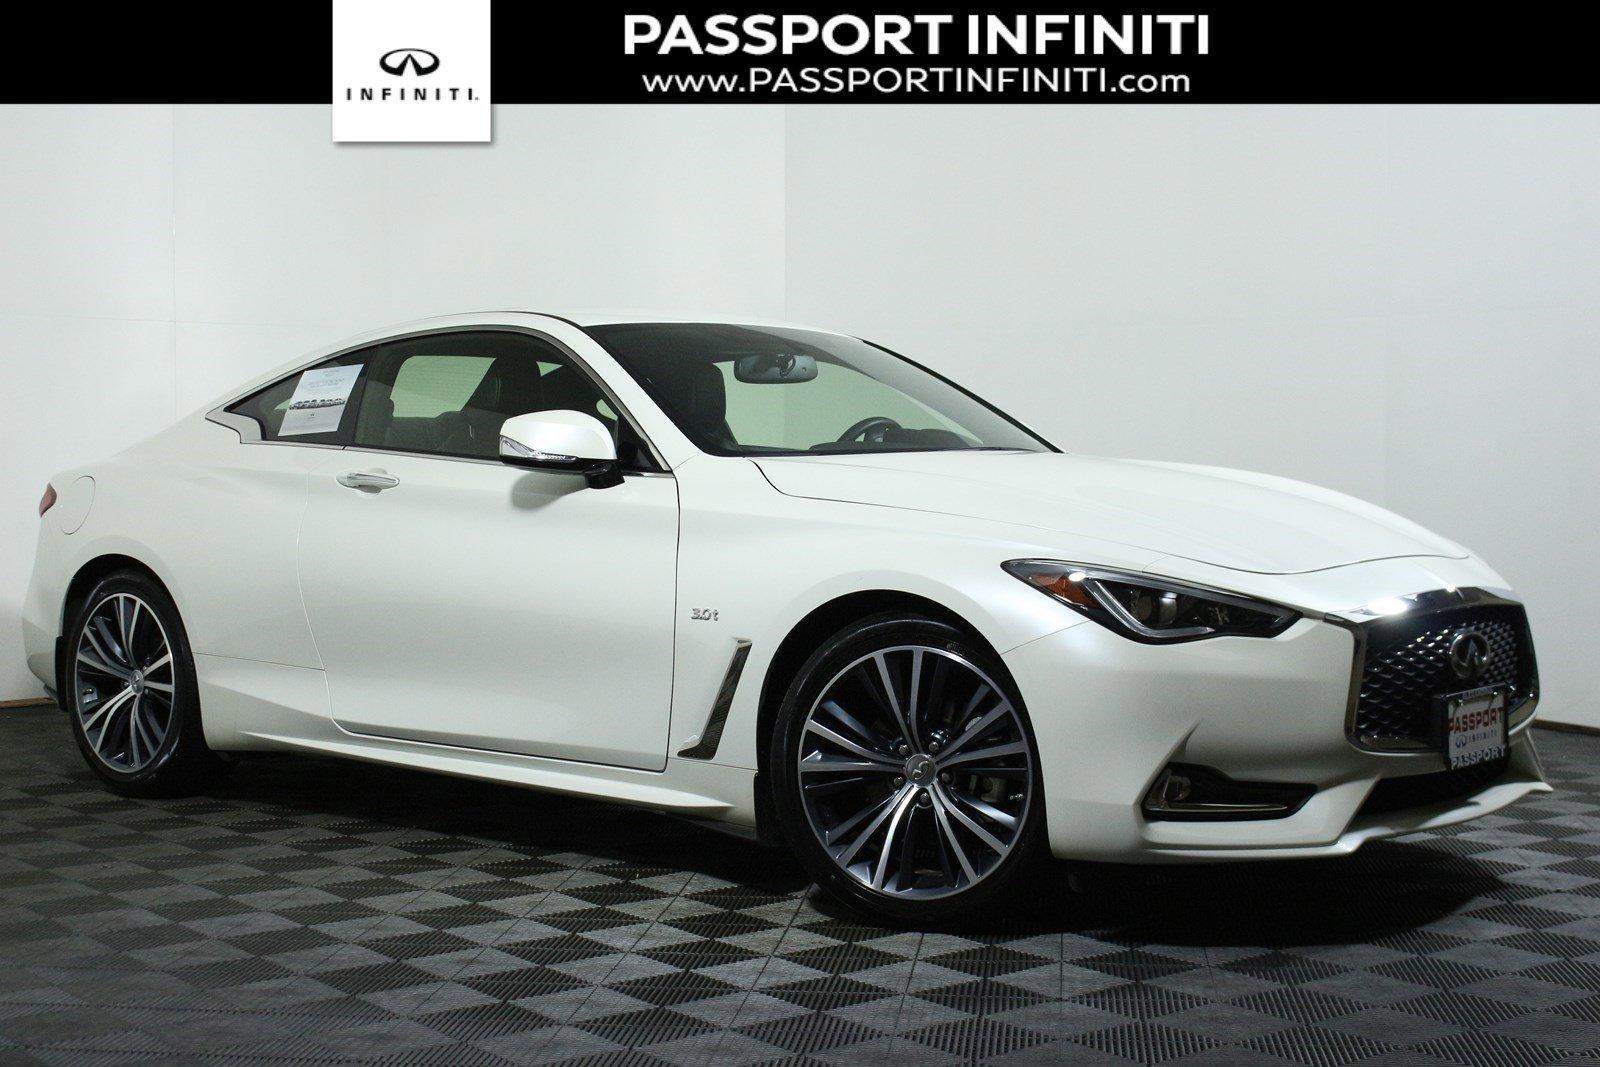 2018 INFINITI Q60 3.0t AWD Coupe image